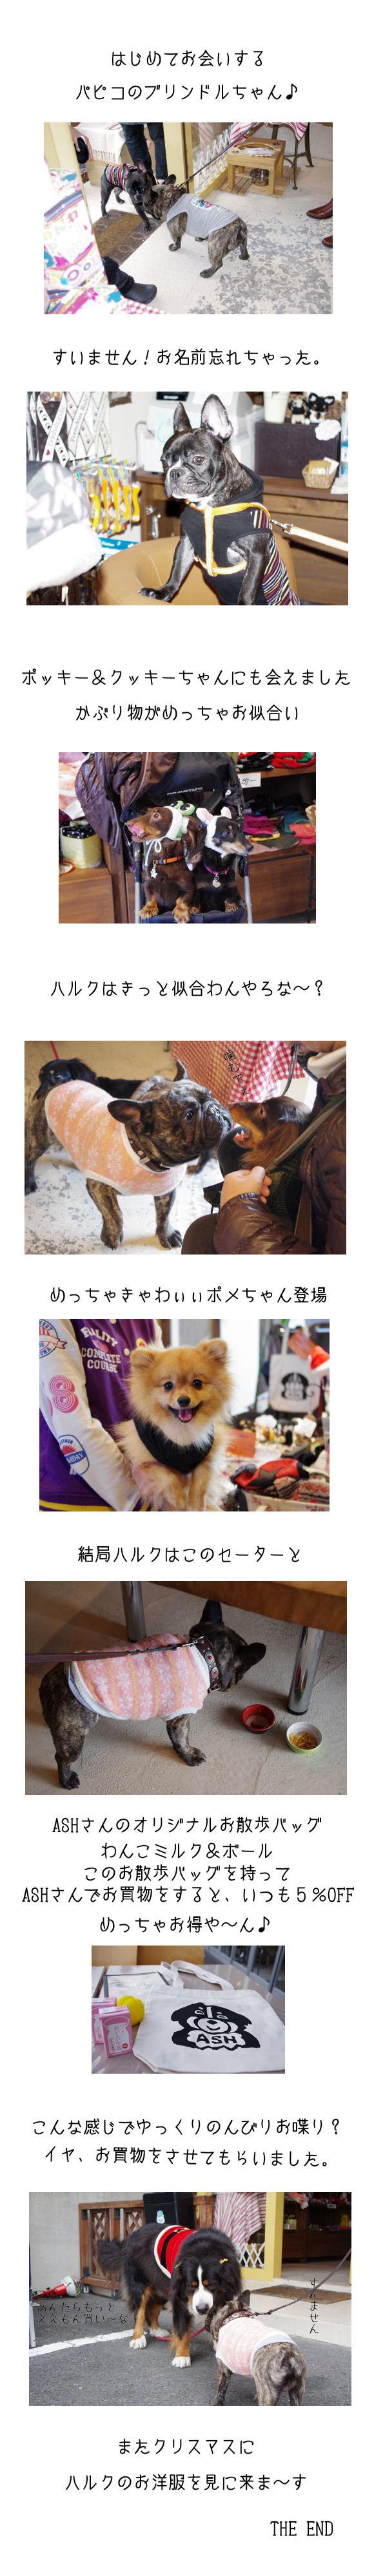 ASH秋祭り♪♪